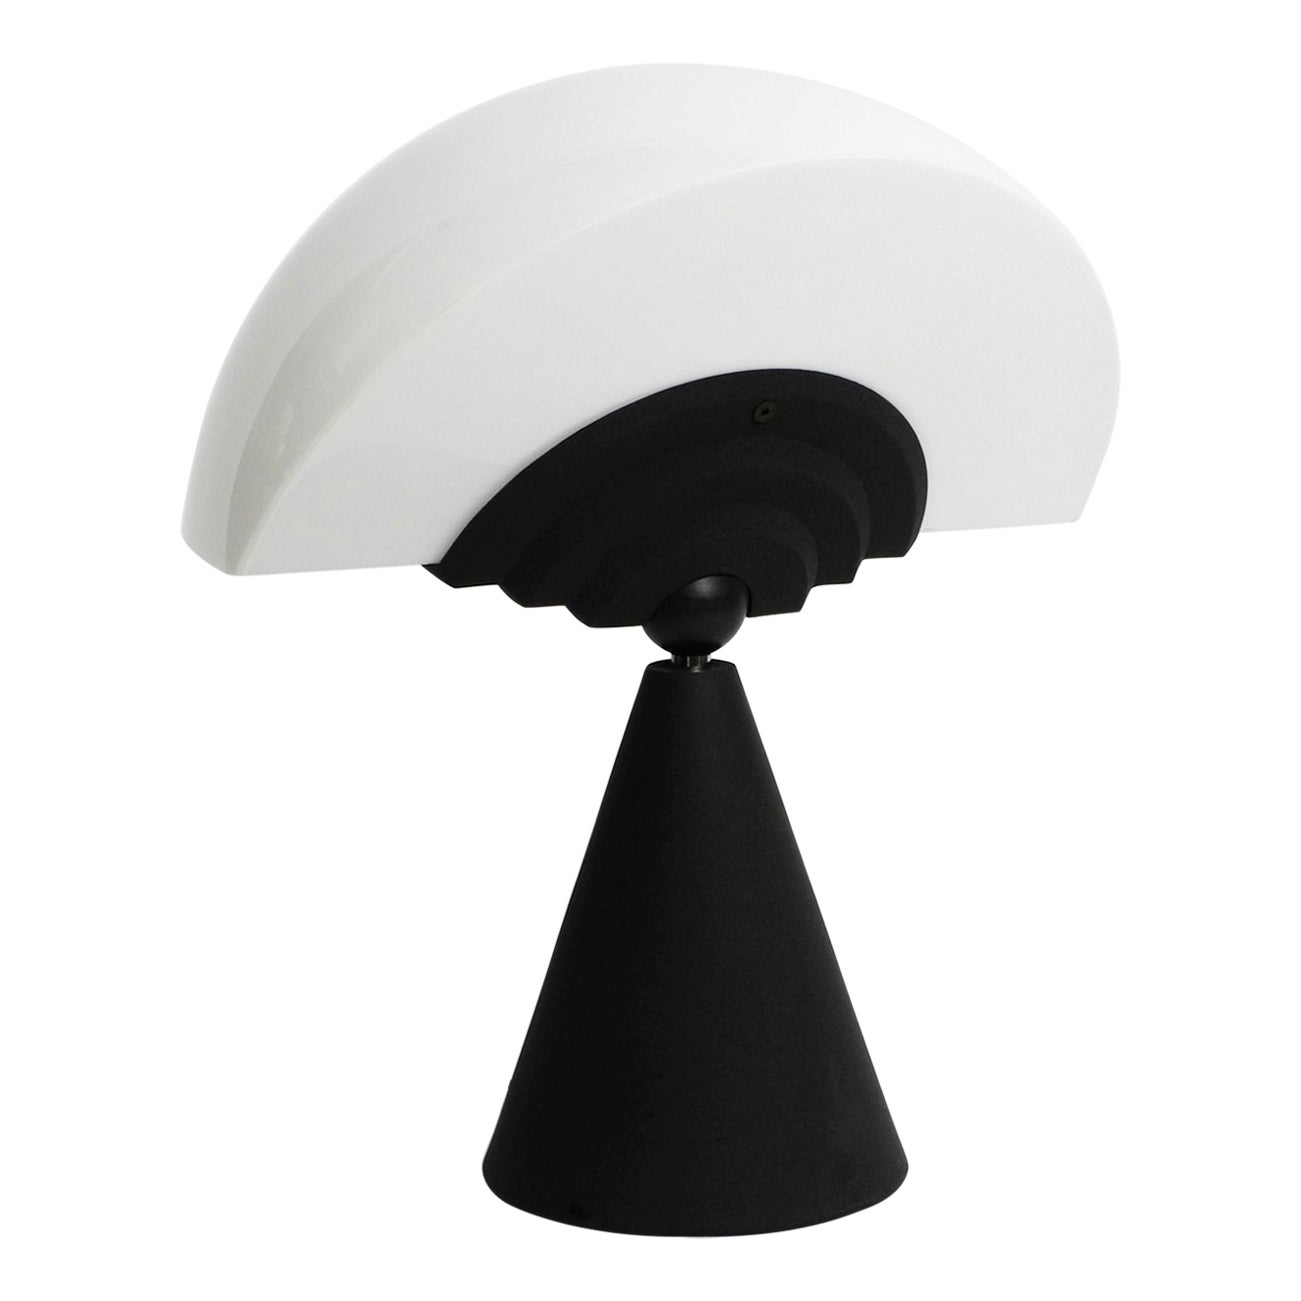 Large Table Lamp Model Slice by Hans Von Klier for Bilumen, 1987